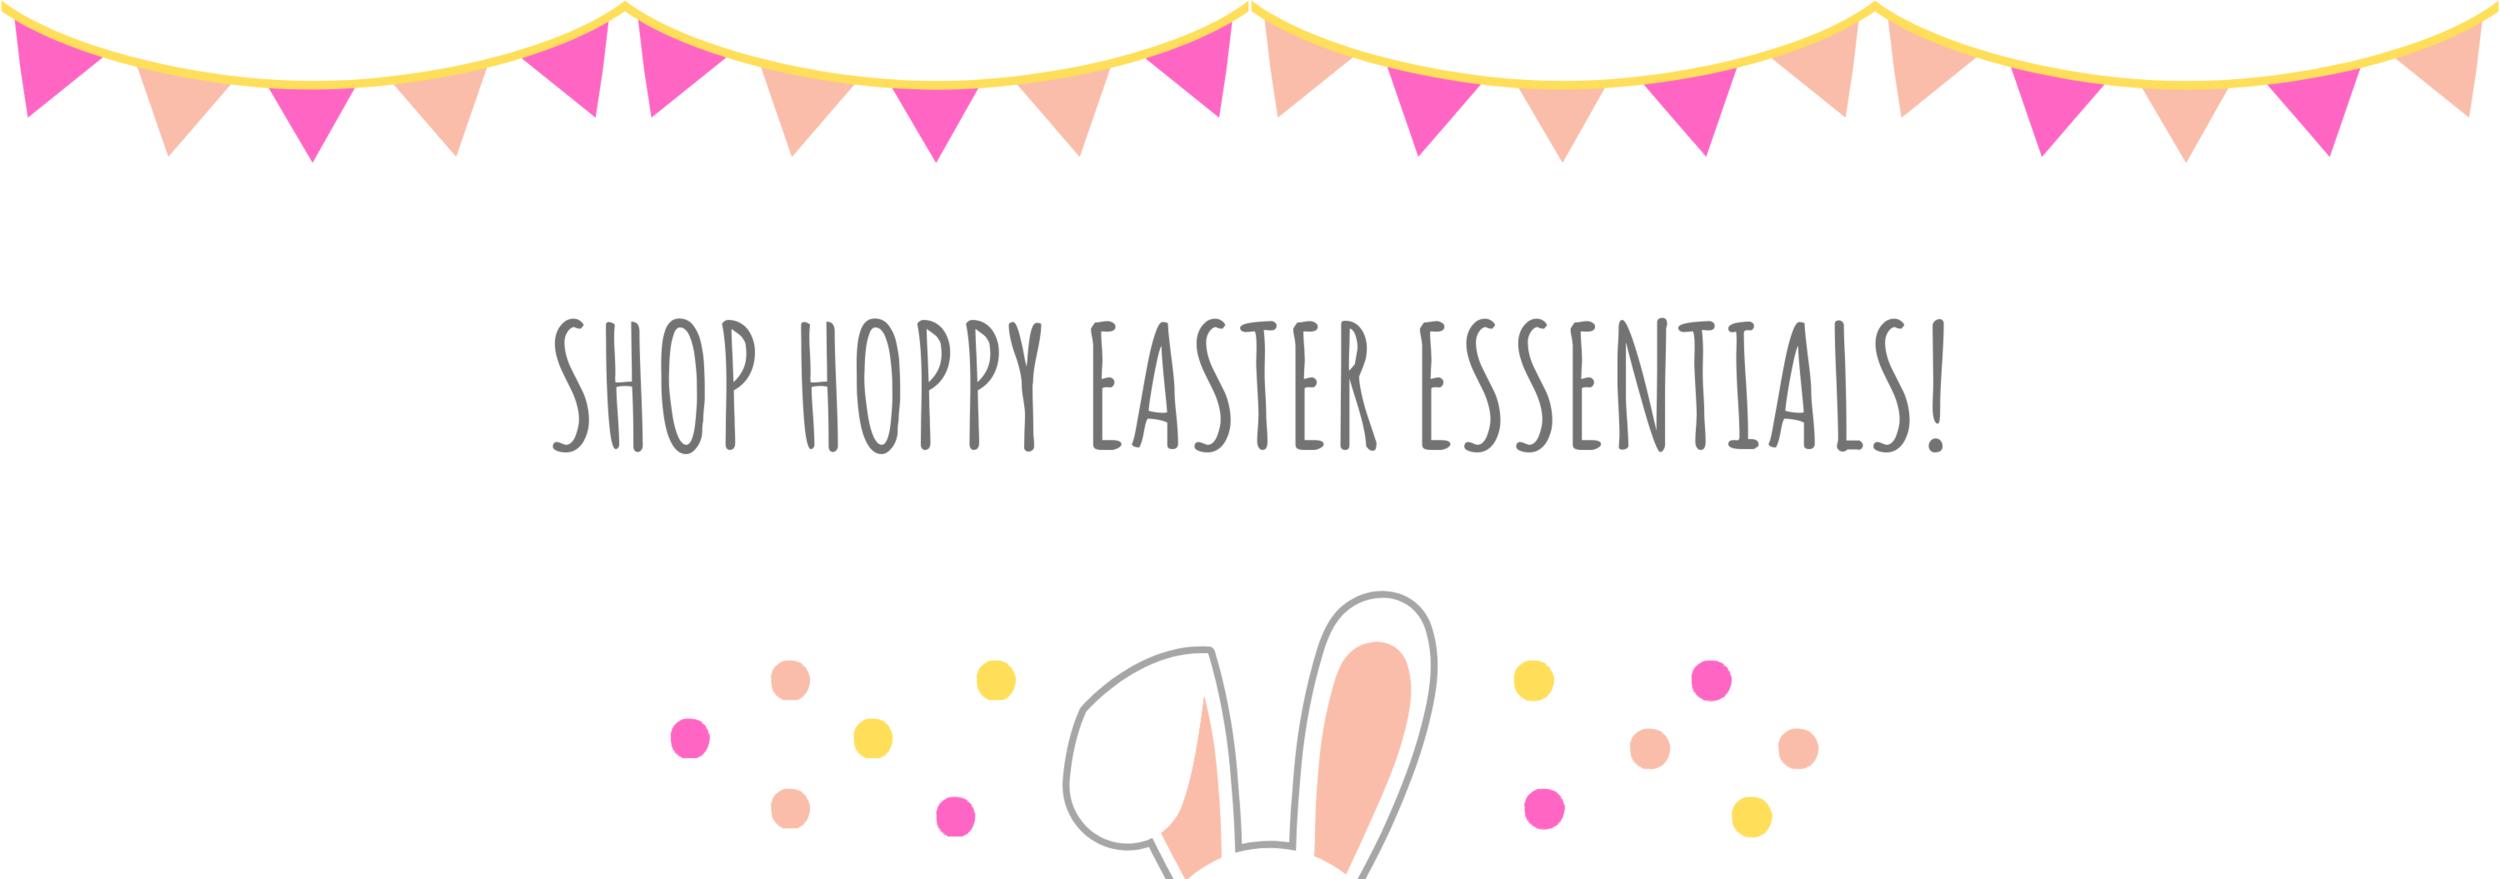 Shop my favorite Easter finds!